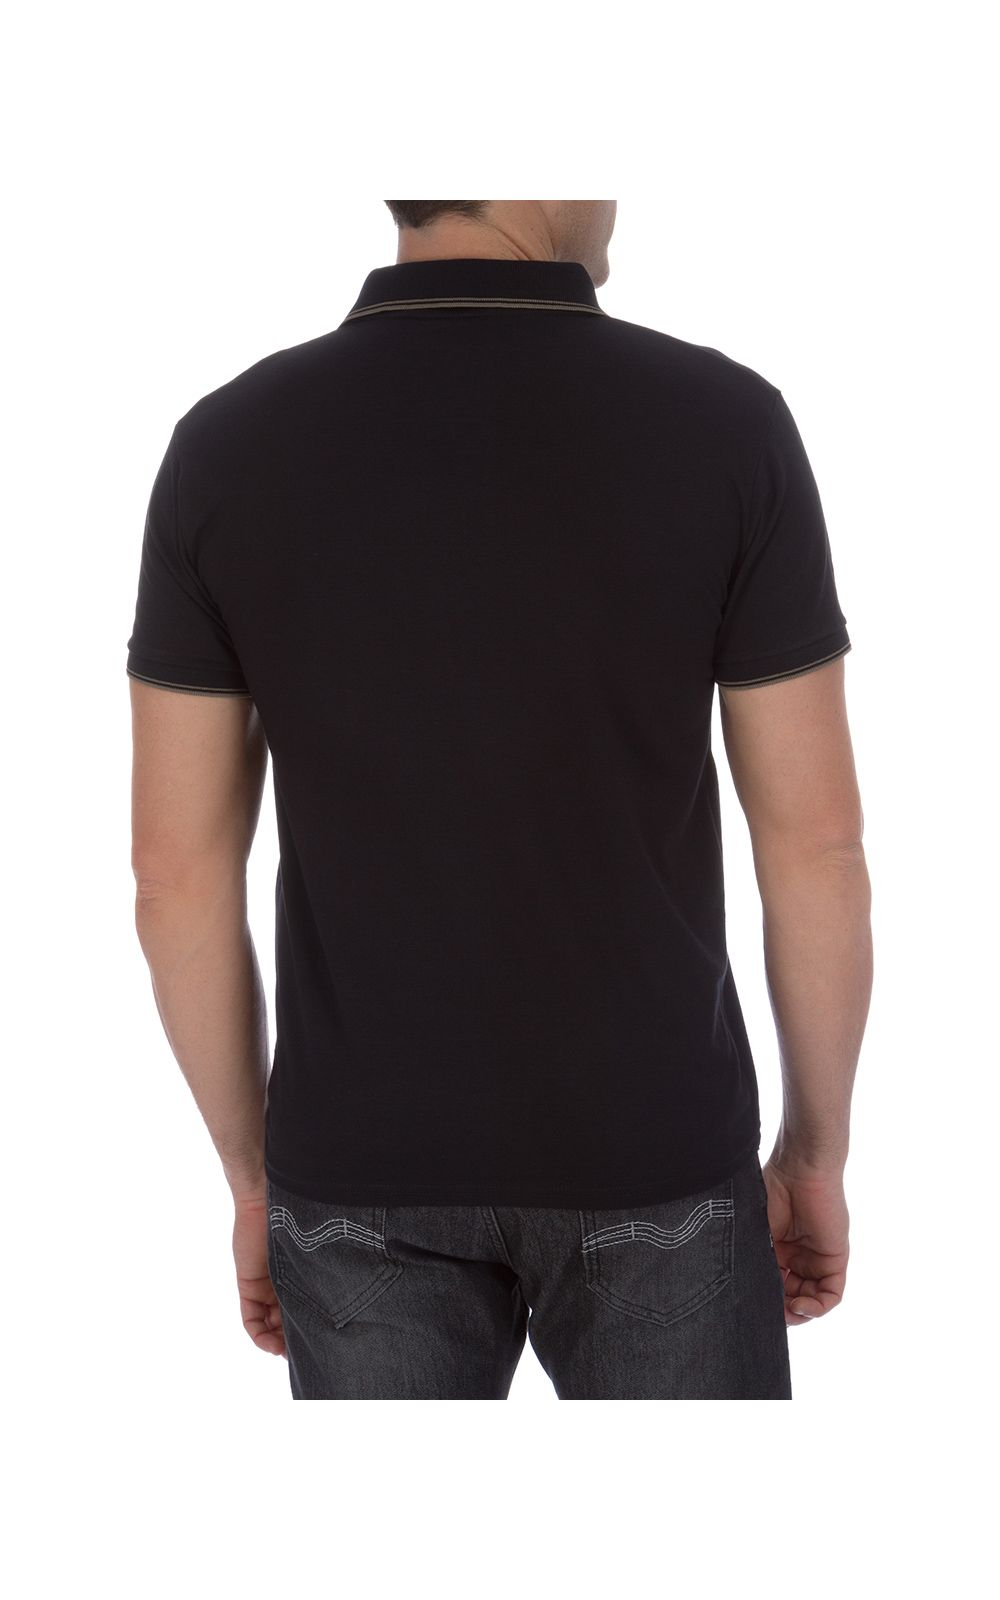 Foto 2 - Camisa Polo Masculina Preta Detalhada